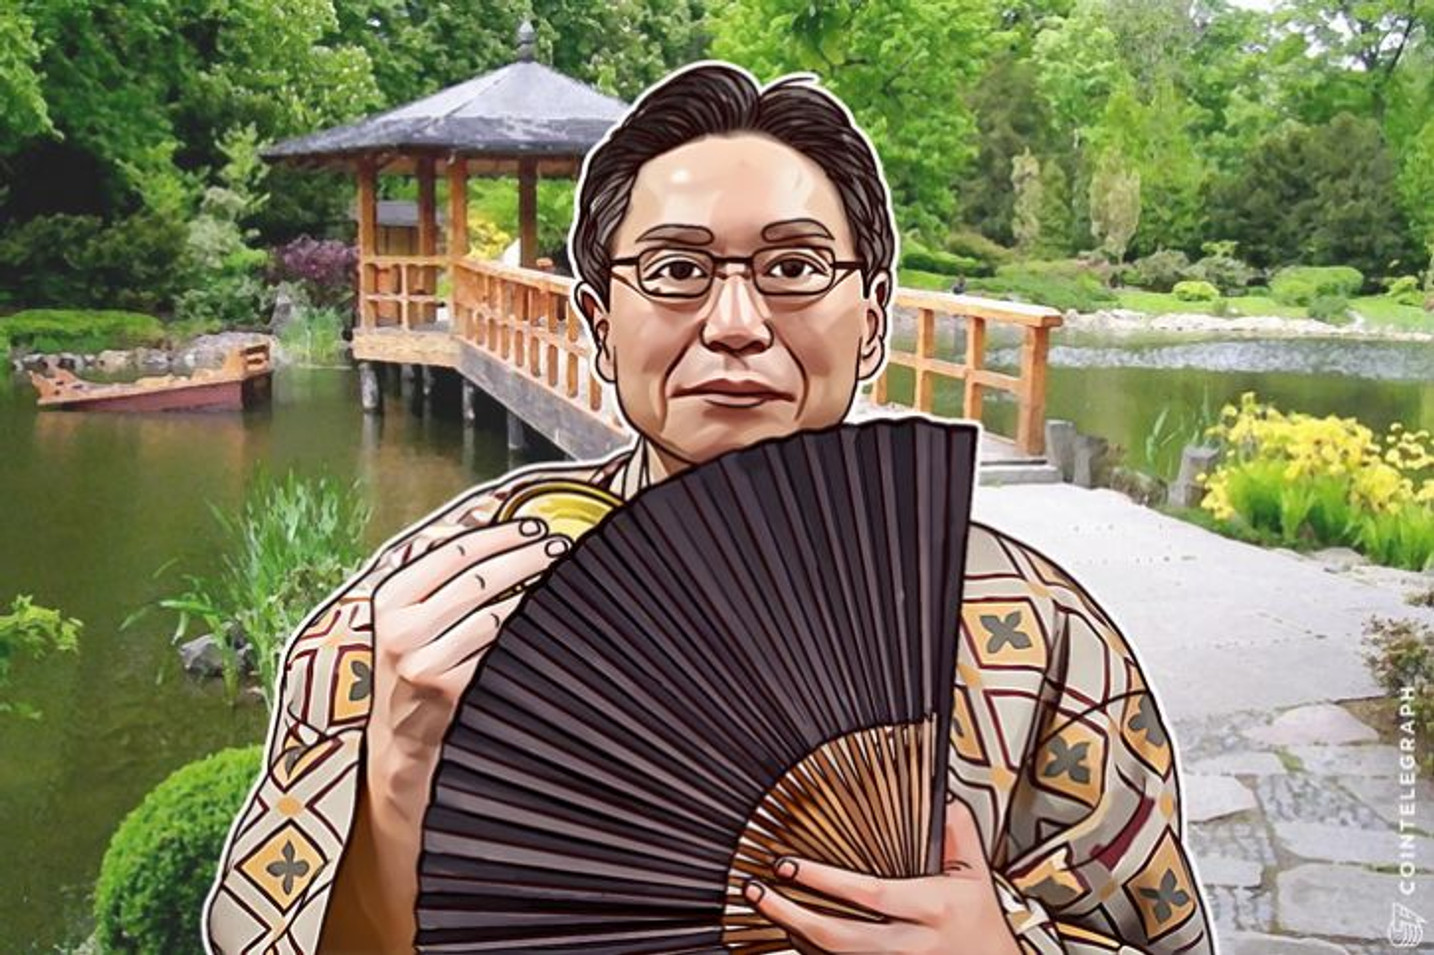 Singapore Regulator Selects Japan For Next FinTech Knowledge Partner